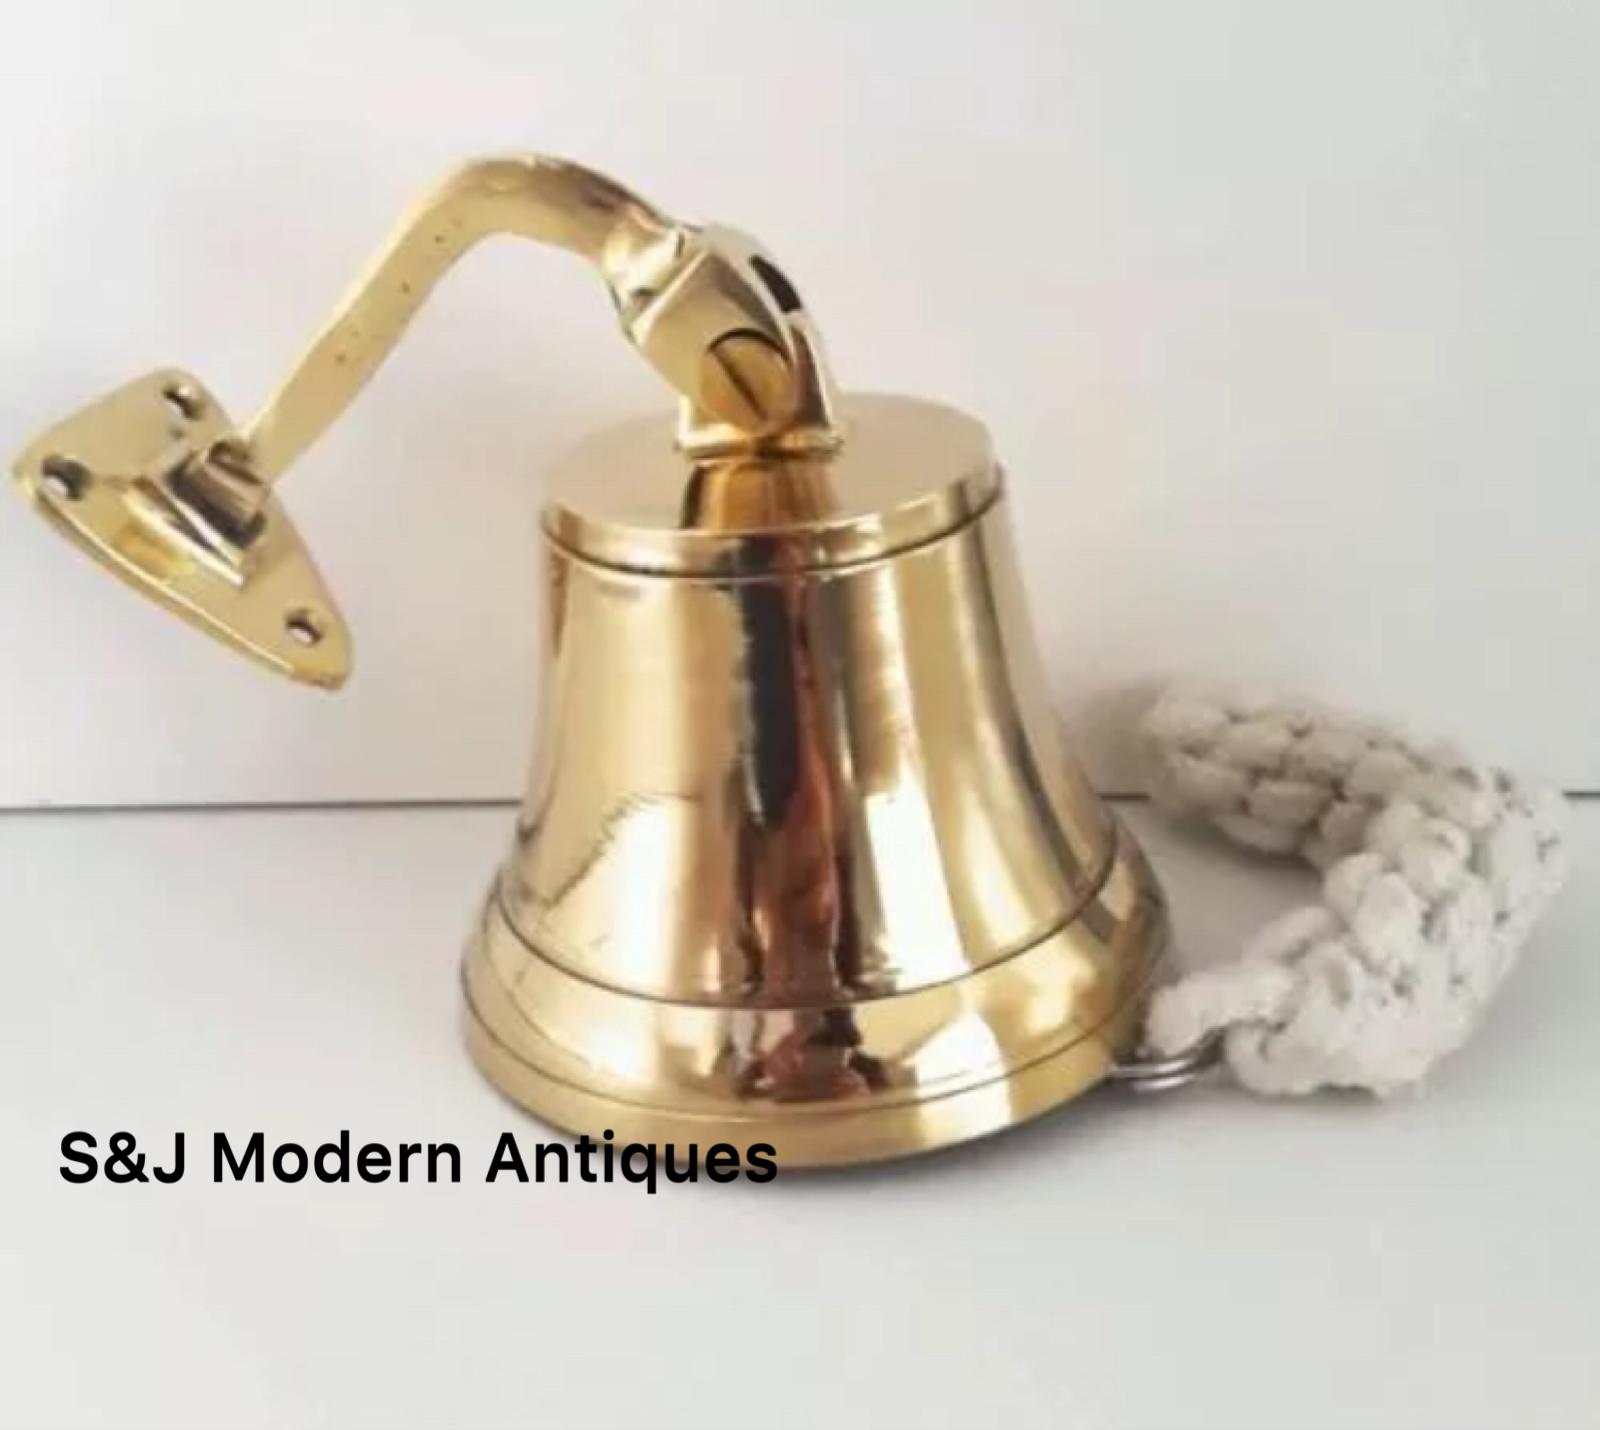 Antique Brass Wall Bell Vintage Ship's School Pub Last Orders Dinner Door 3 inch 10